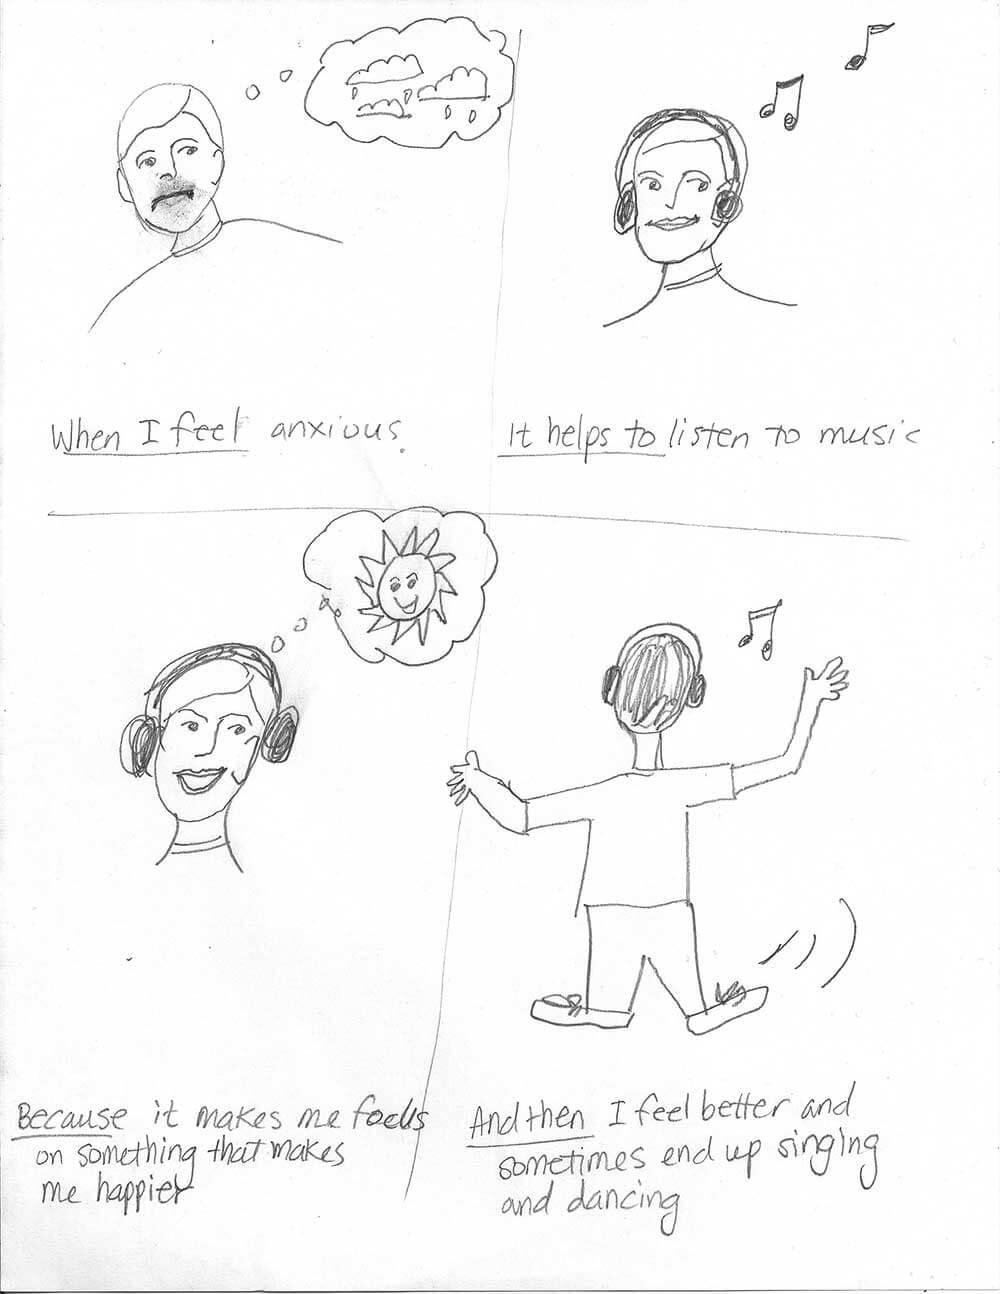 Participant's comic three